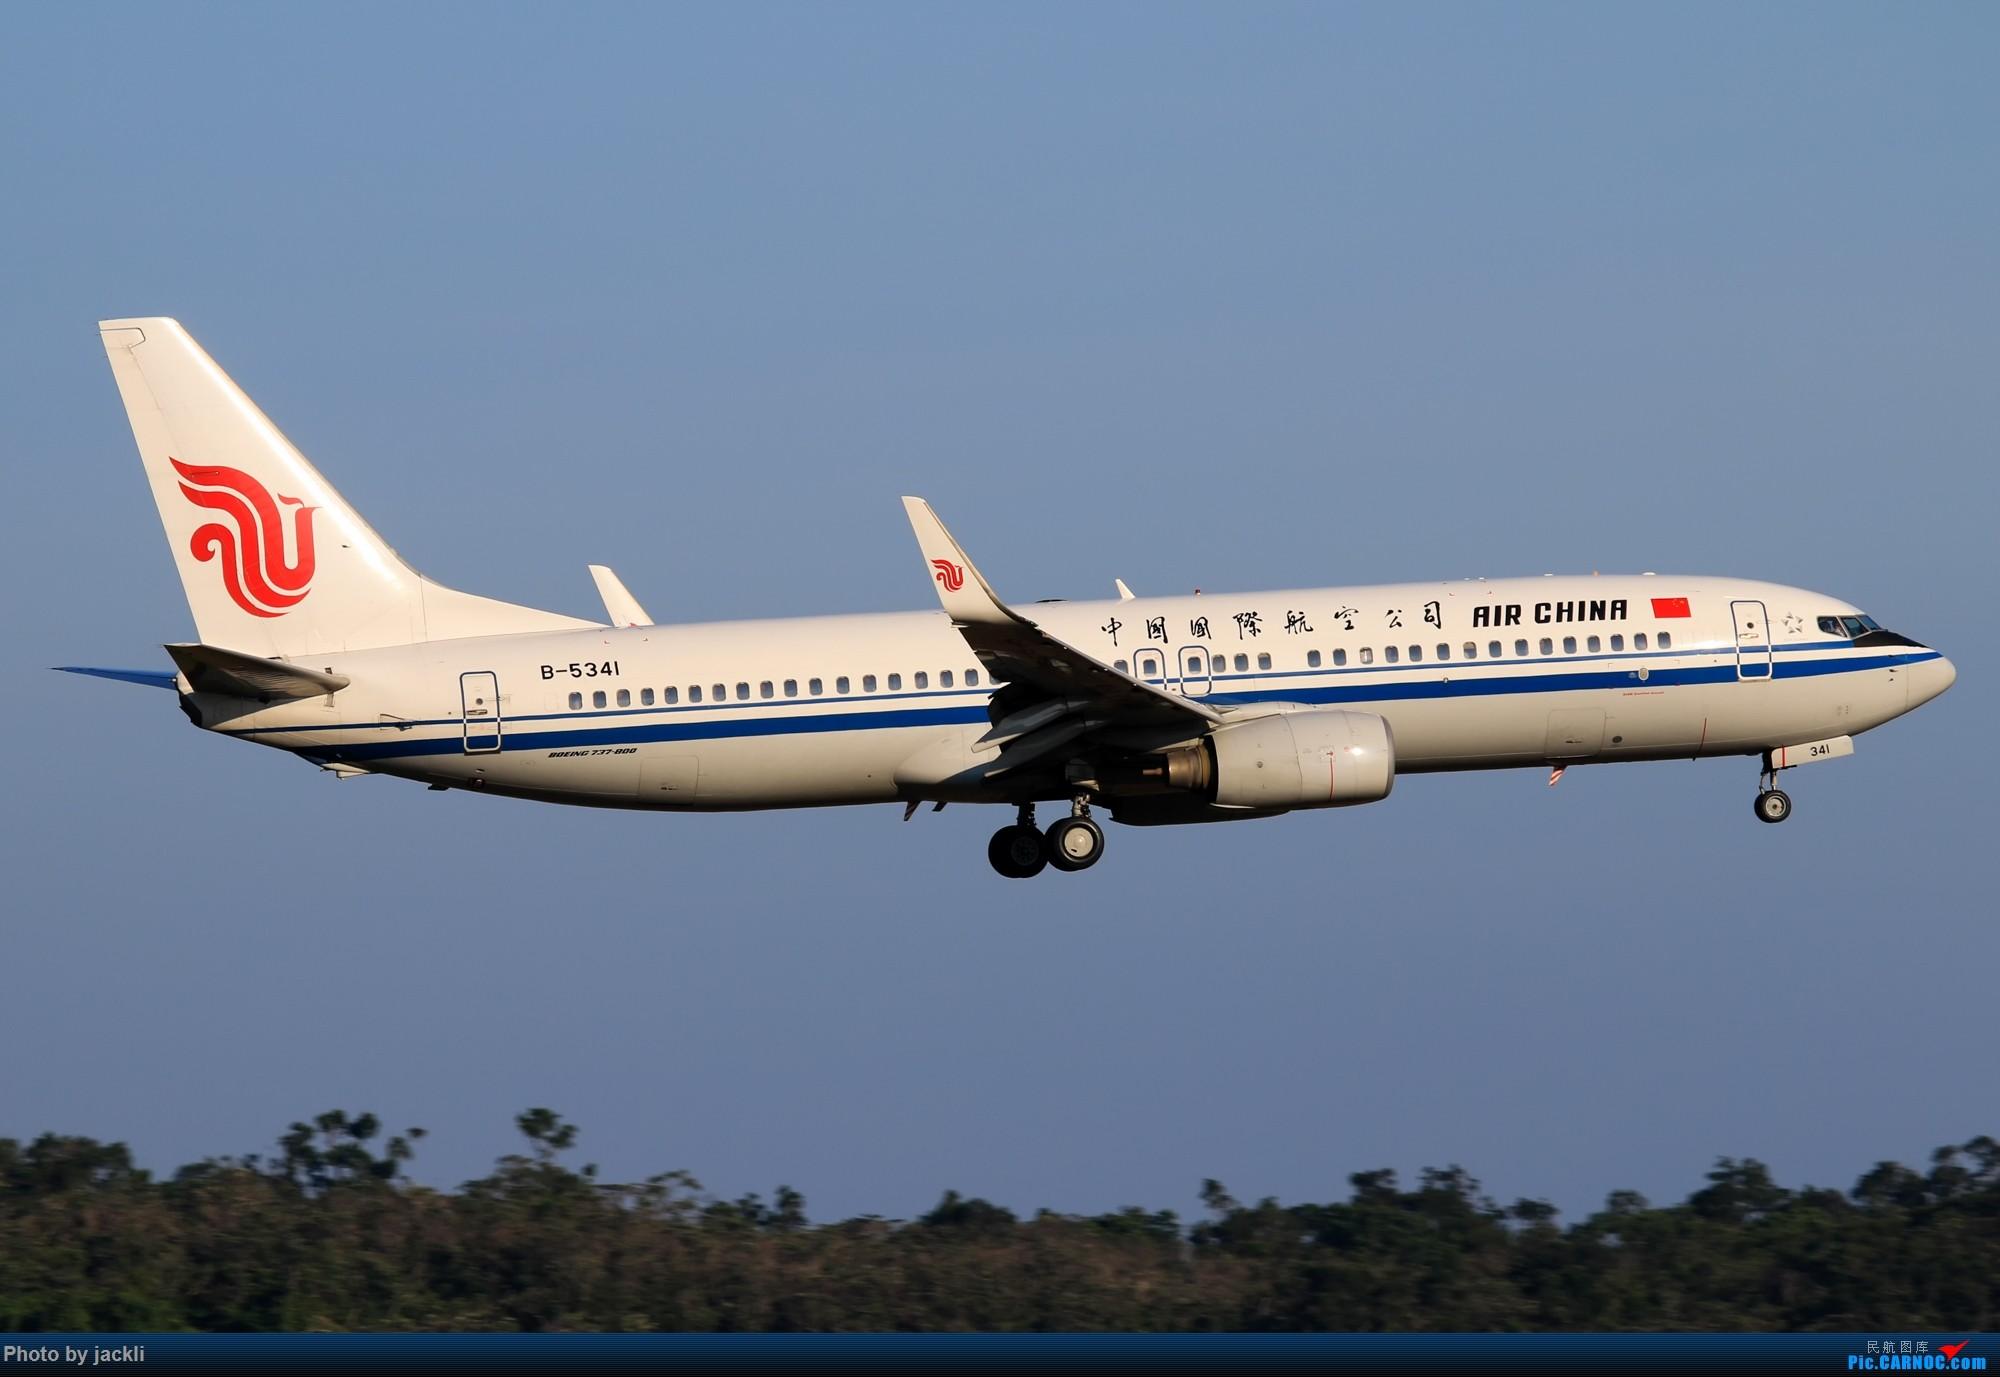 Re:[原创]【JackLi】抓住好天的尾巴~川航330在珠海训练~ BOEING 737-800 B-5341 中国珠海金湾机场